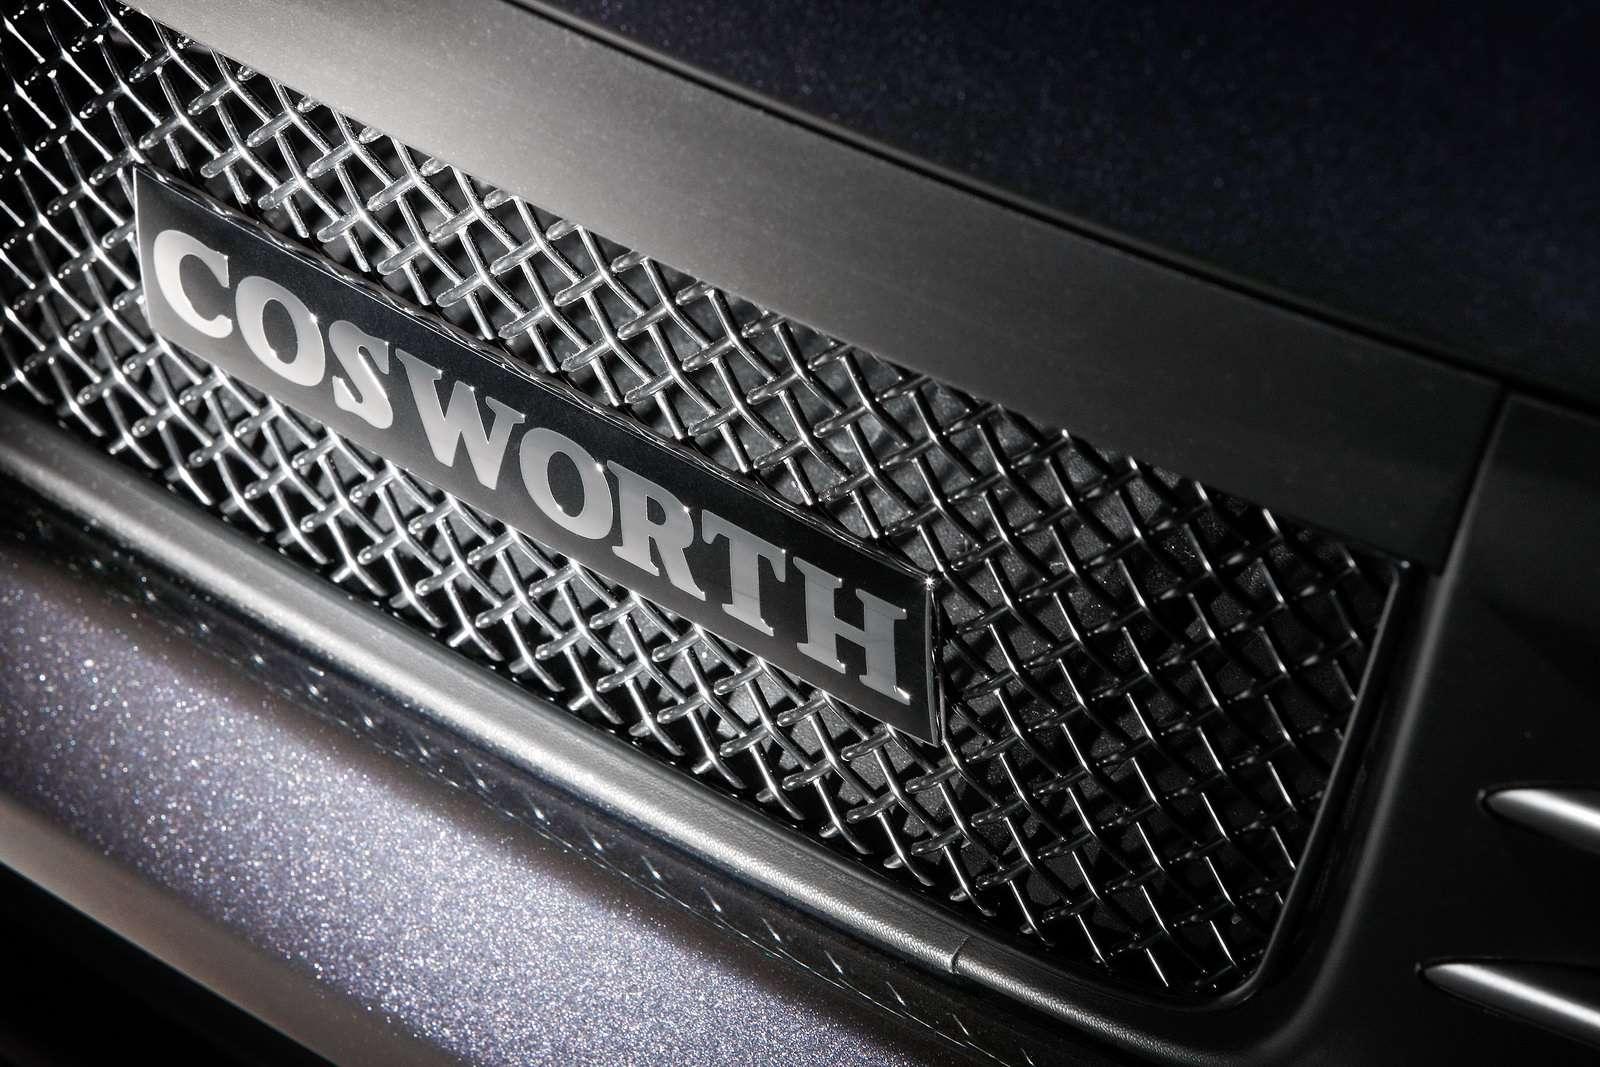 Subaru Impreza STI CS400 Cosworth marzec 2010